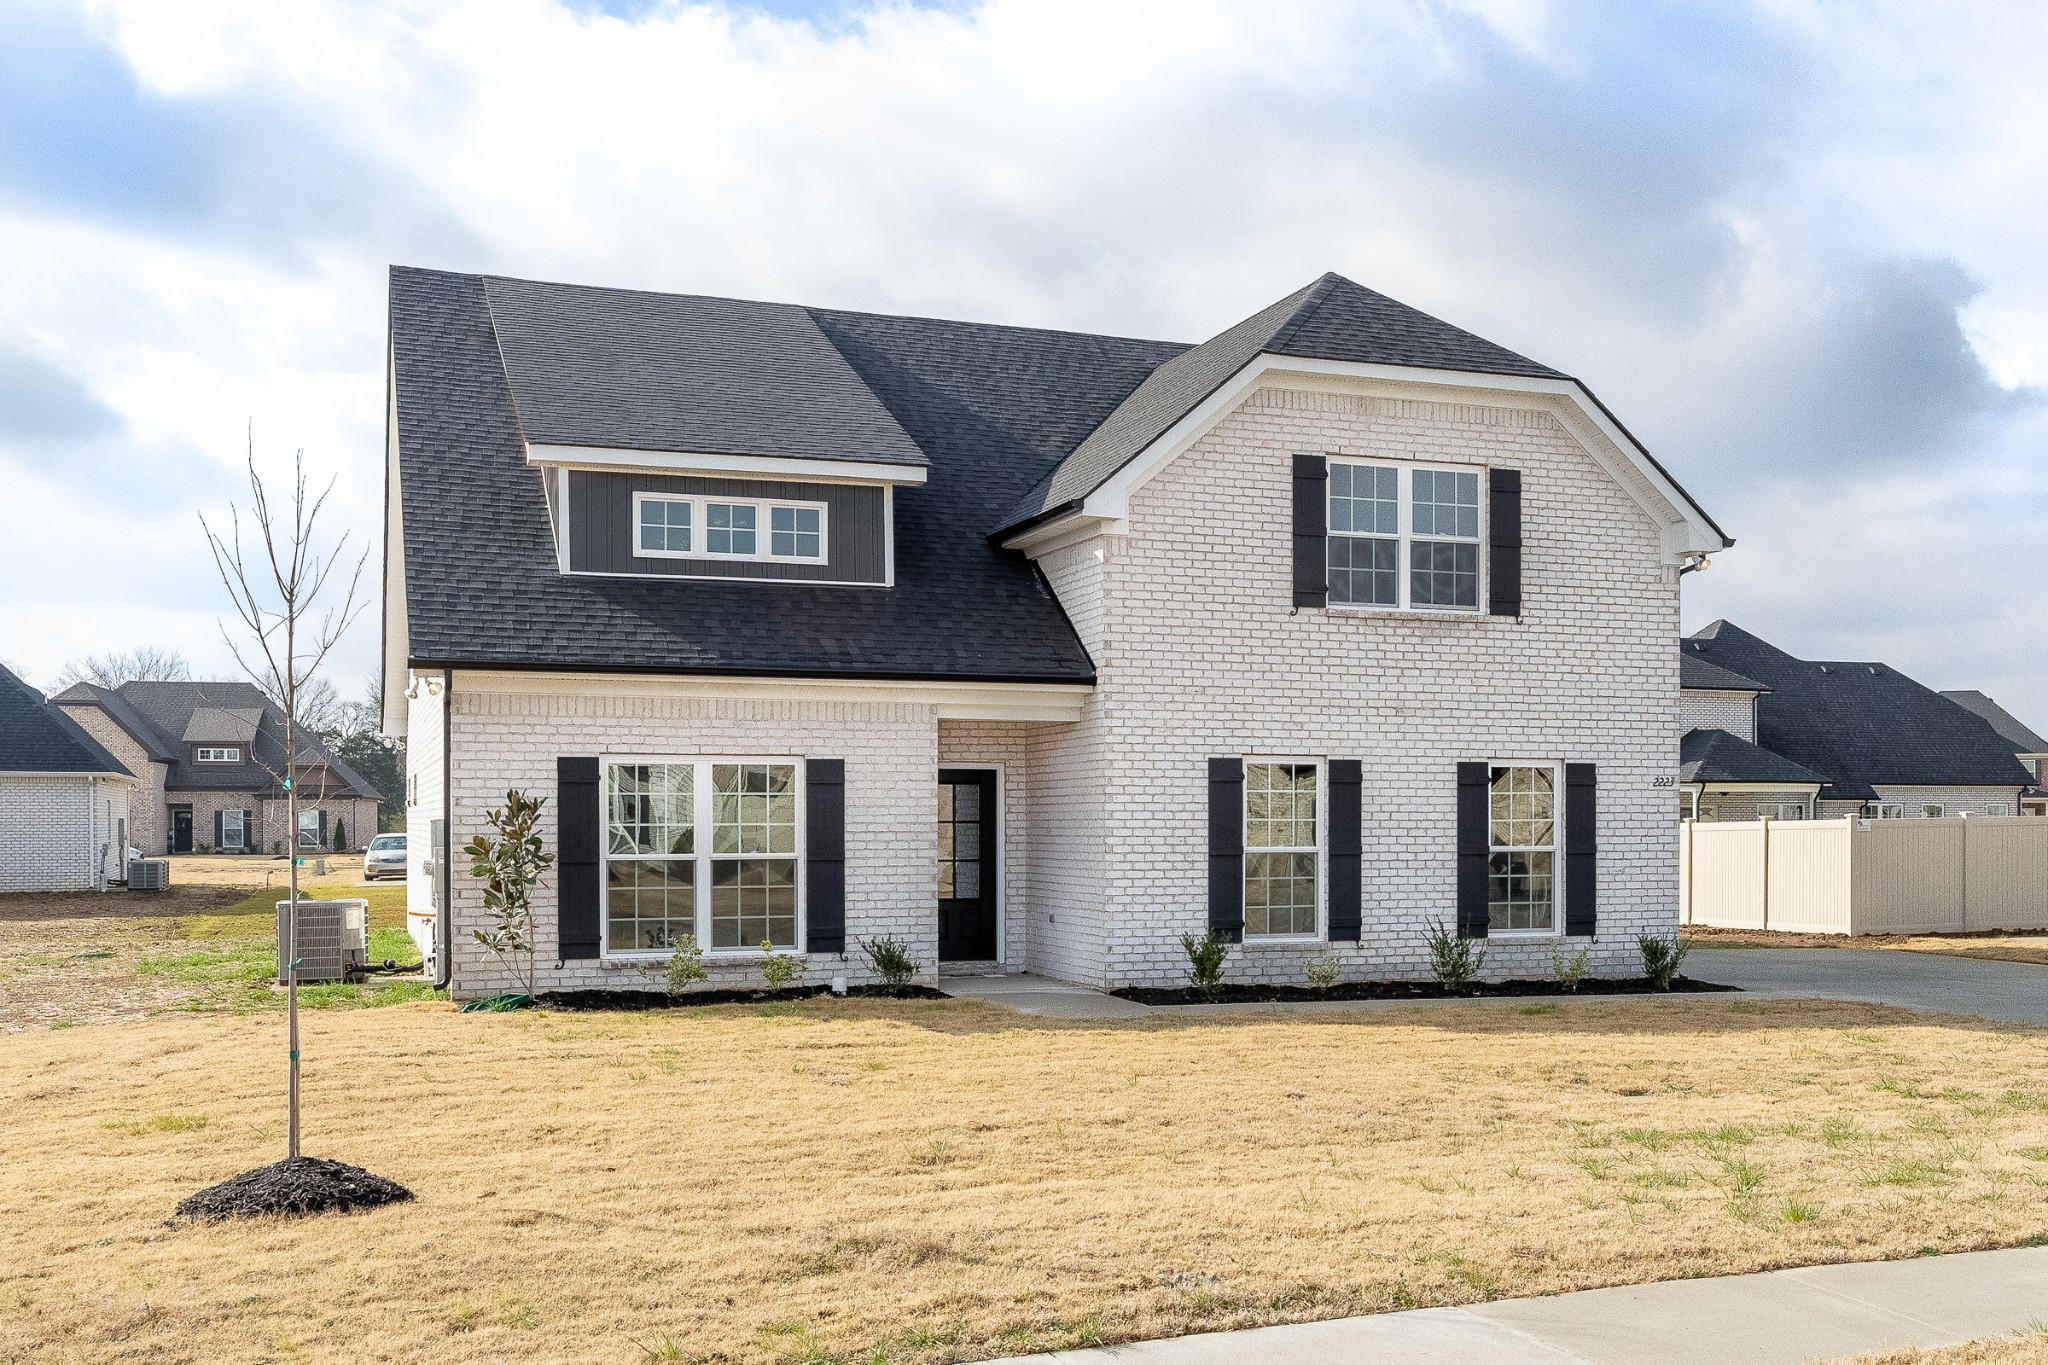 Barfield Downs Sec 5 Ph 1 Real Estate Listings Main Image